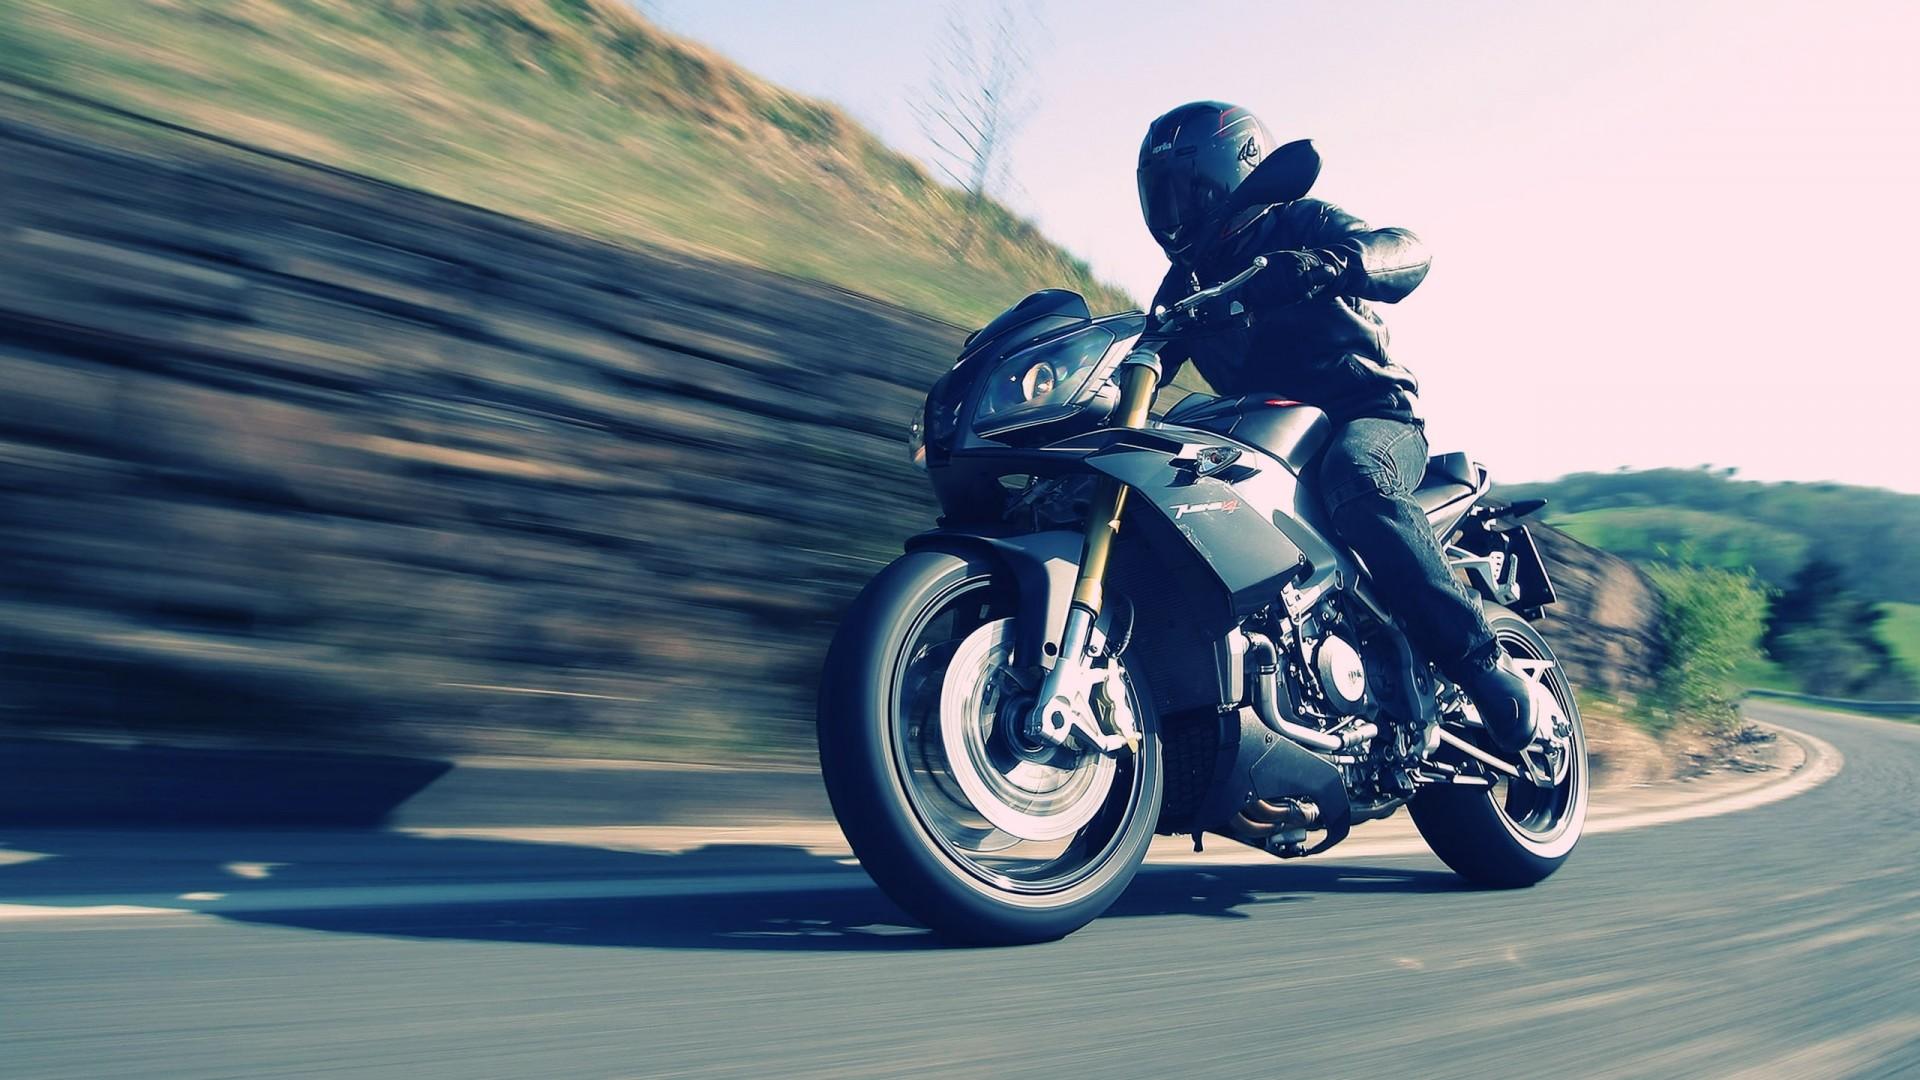 Maintenir sa moto en parfait état : 5 conseils clés